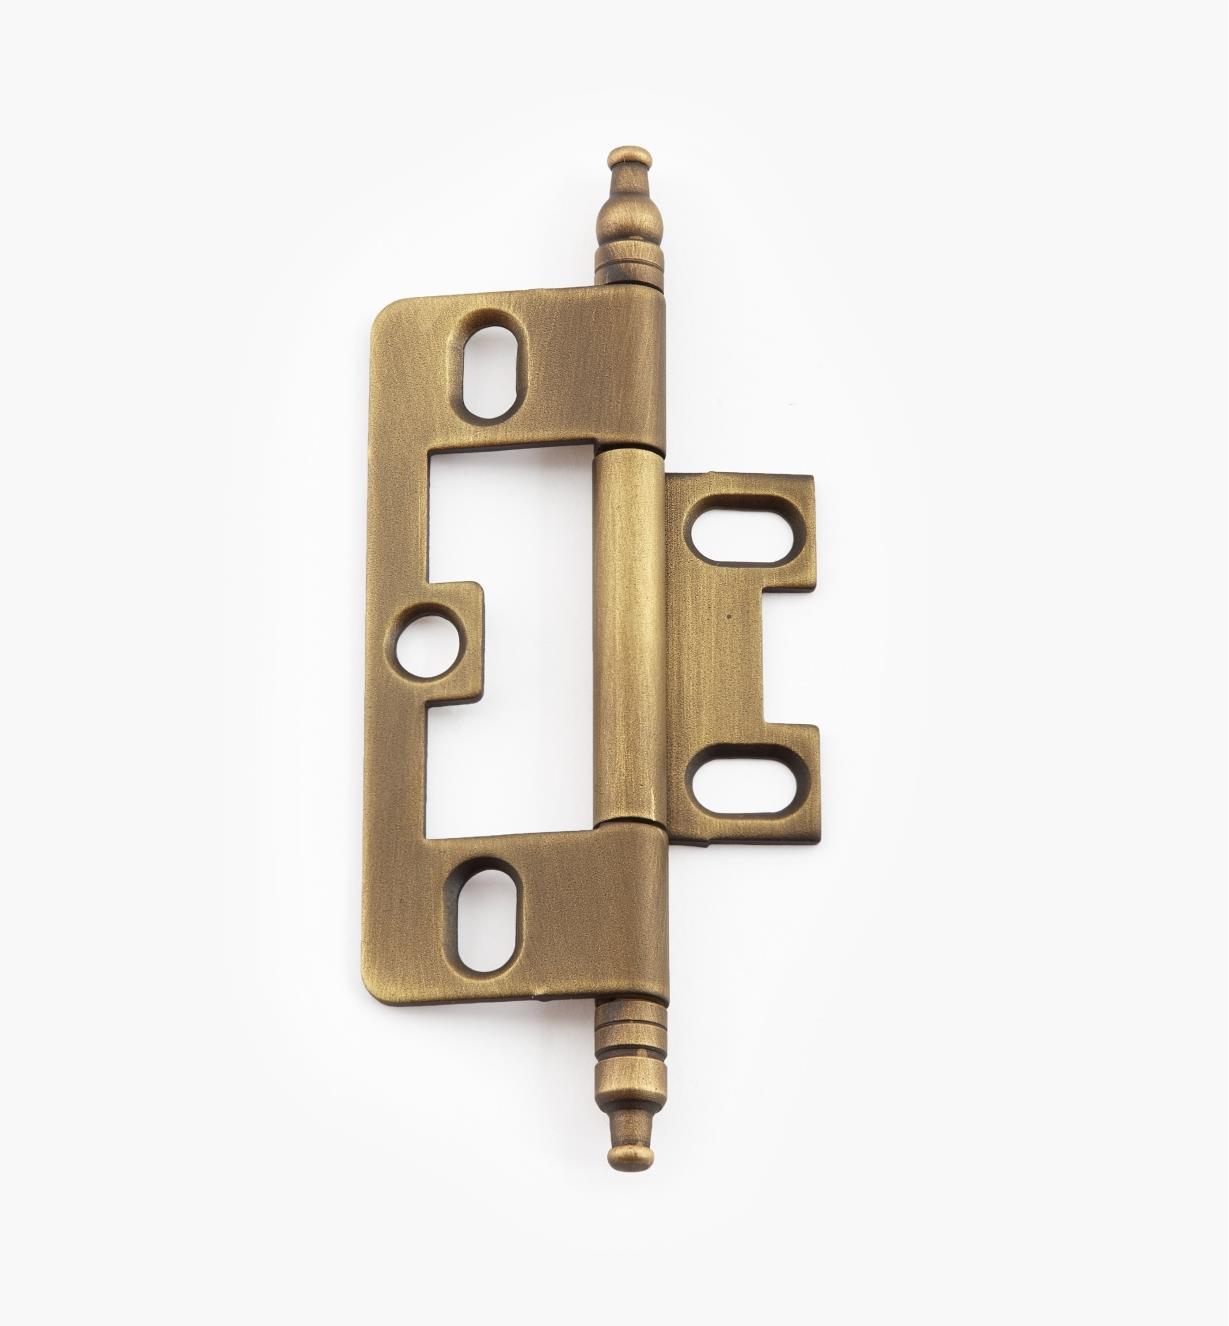 02H1223 - Weathered Brass No-Mortise Hinge/Minaret